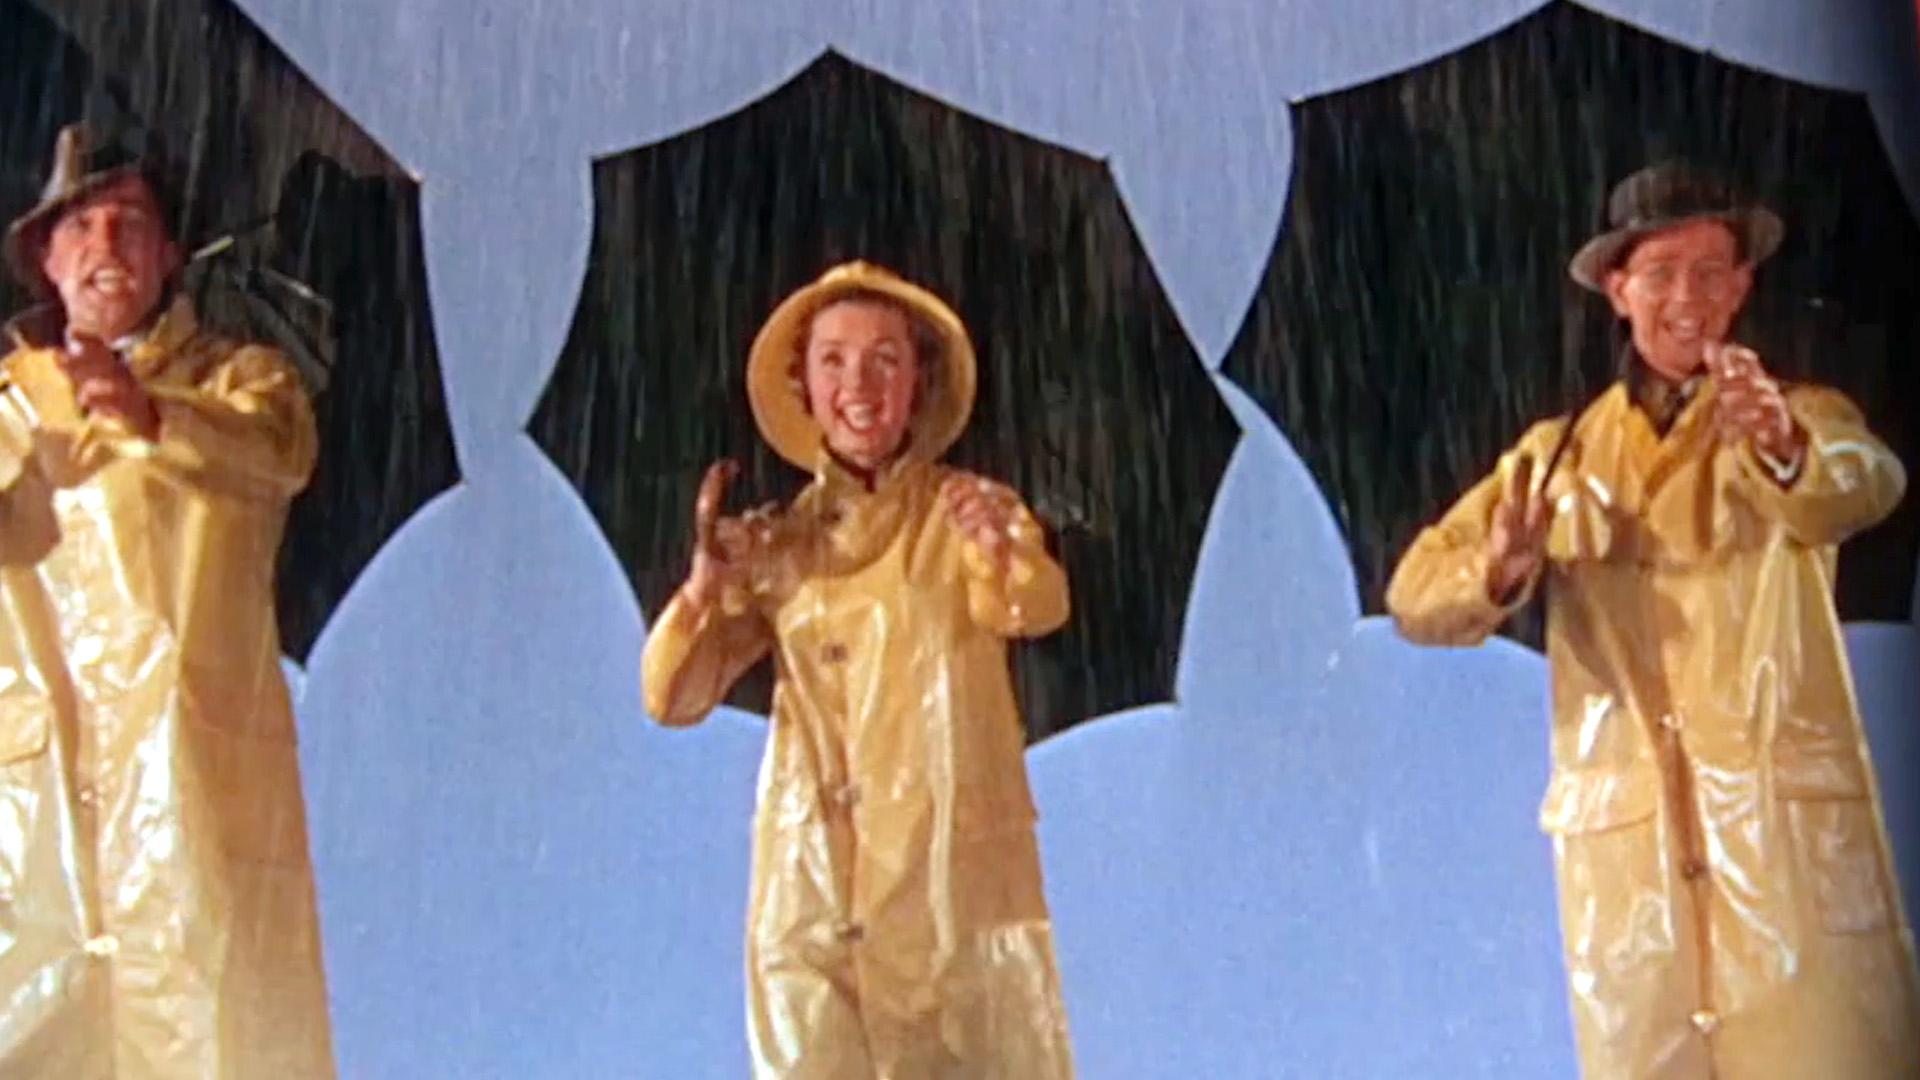 Singin in the Rain 65th Anniversary 1952 presented by TCM 2017  Fandango